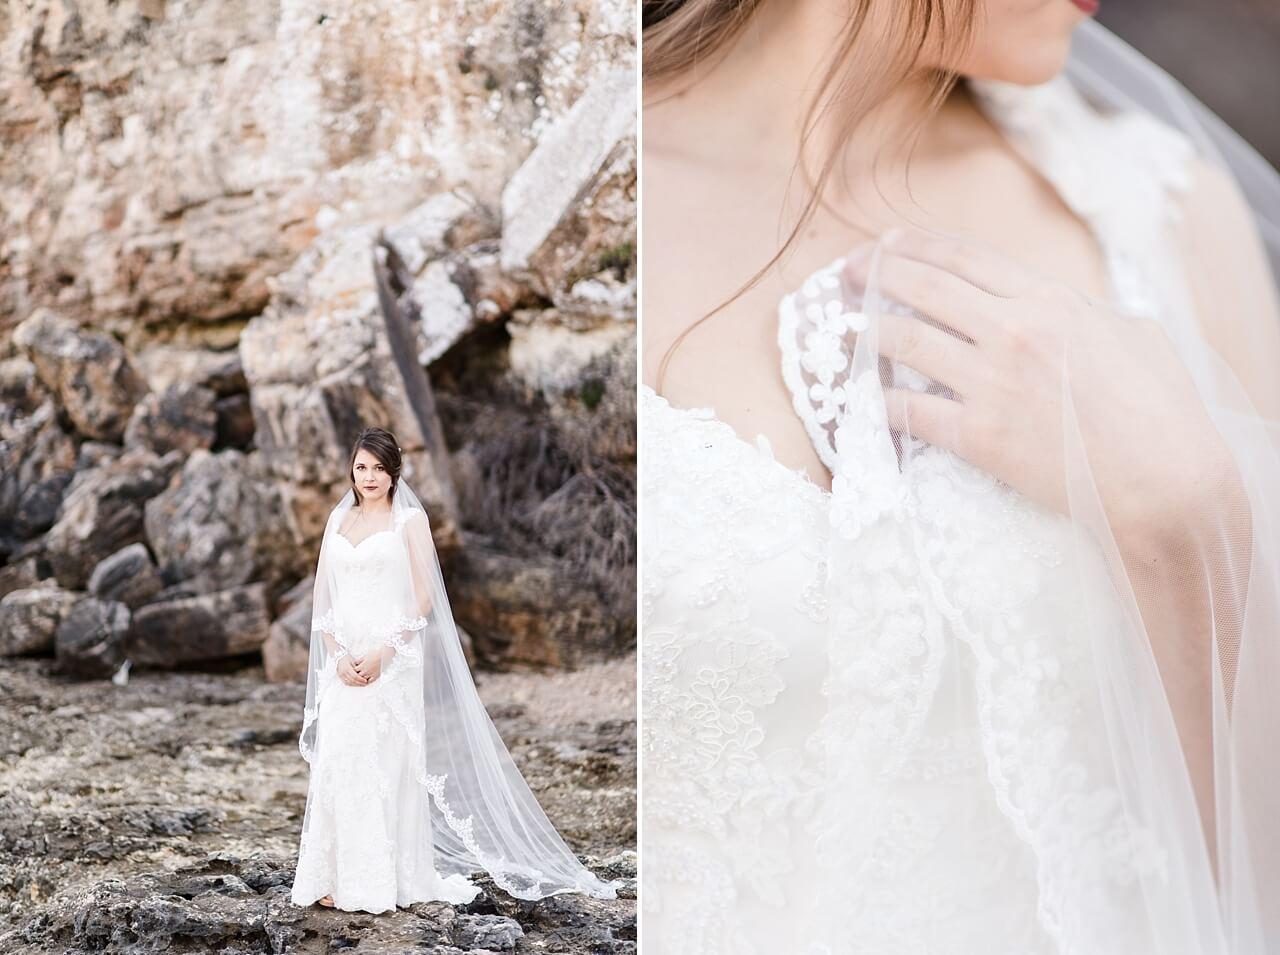 Rebecca Conte Fotografie: After Wedding Shoot Mallorca 22